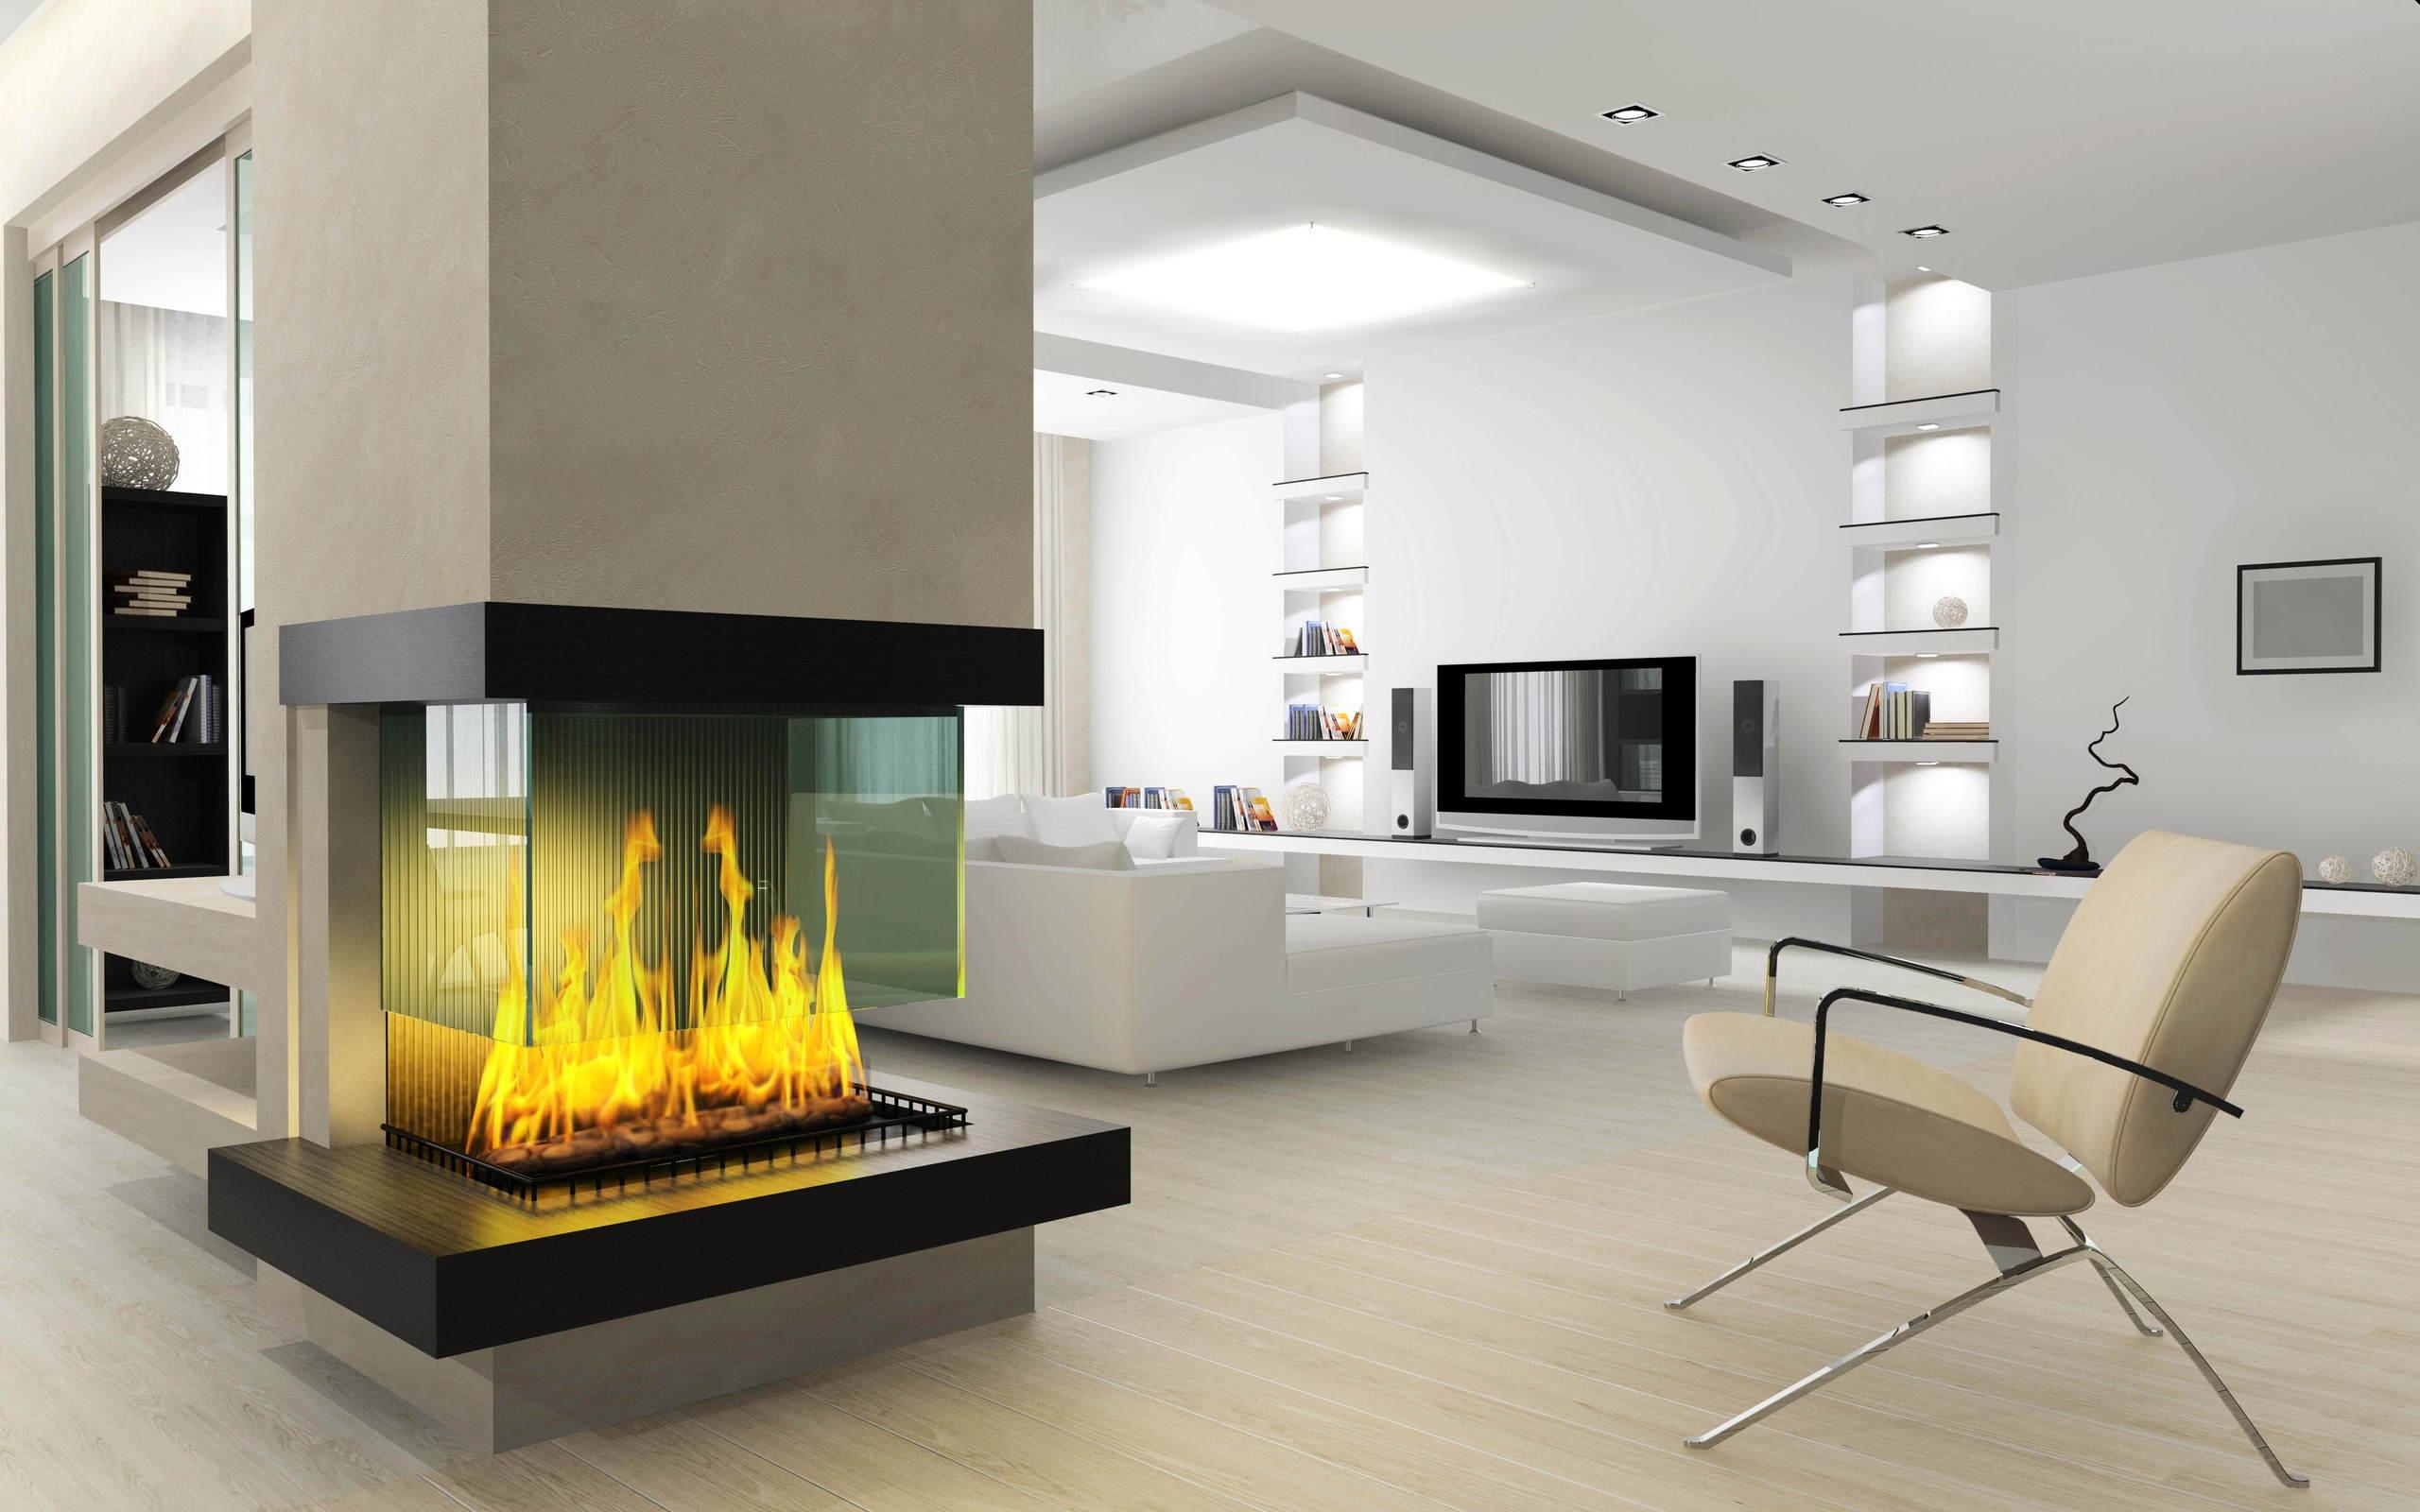 Hintergrundbilder : Zimmer, Innere, Sessel, Kamin, Innenarchitektur ...